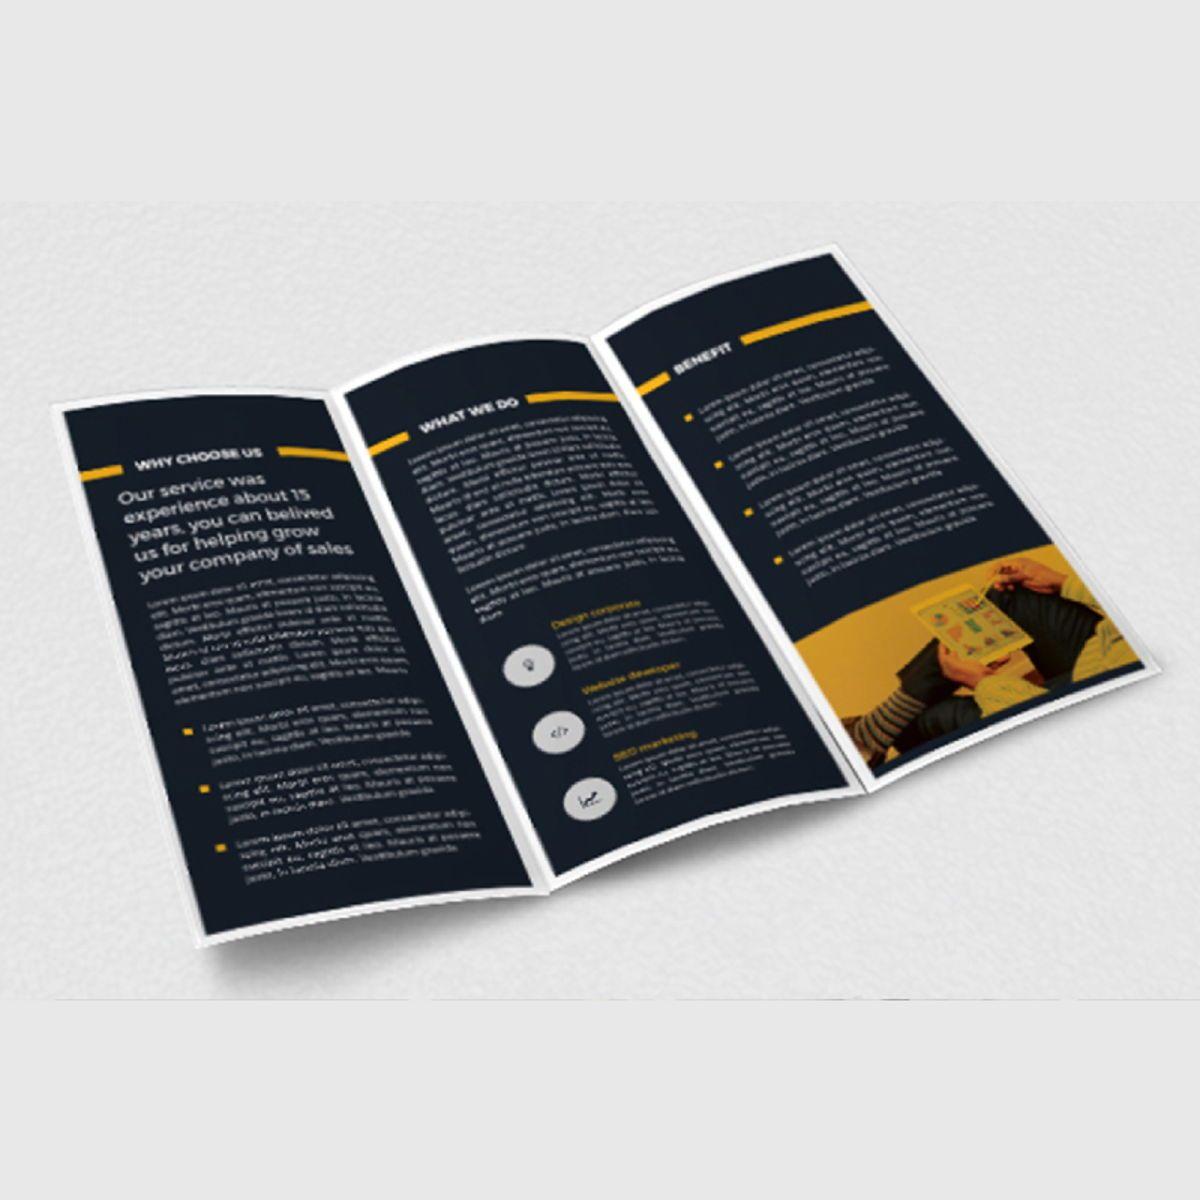 Business Company Trifold Brochure Photoshop Template, Slide 4, 08449, Business — PoweredTemplate.com